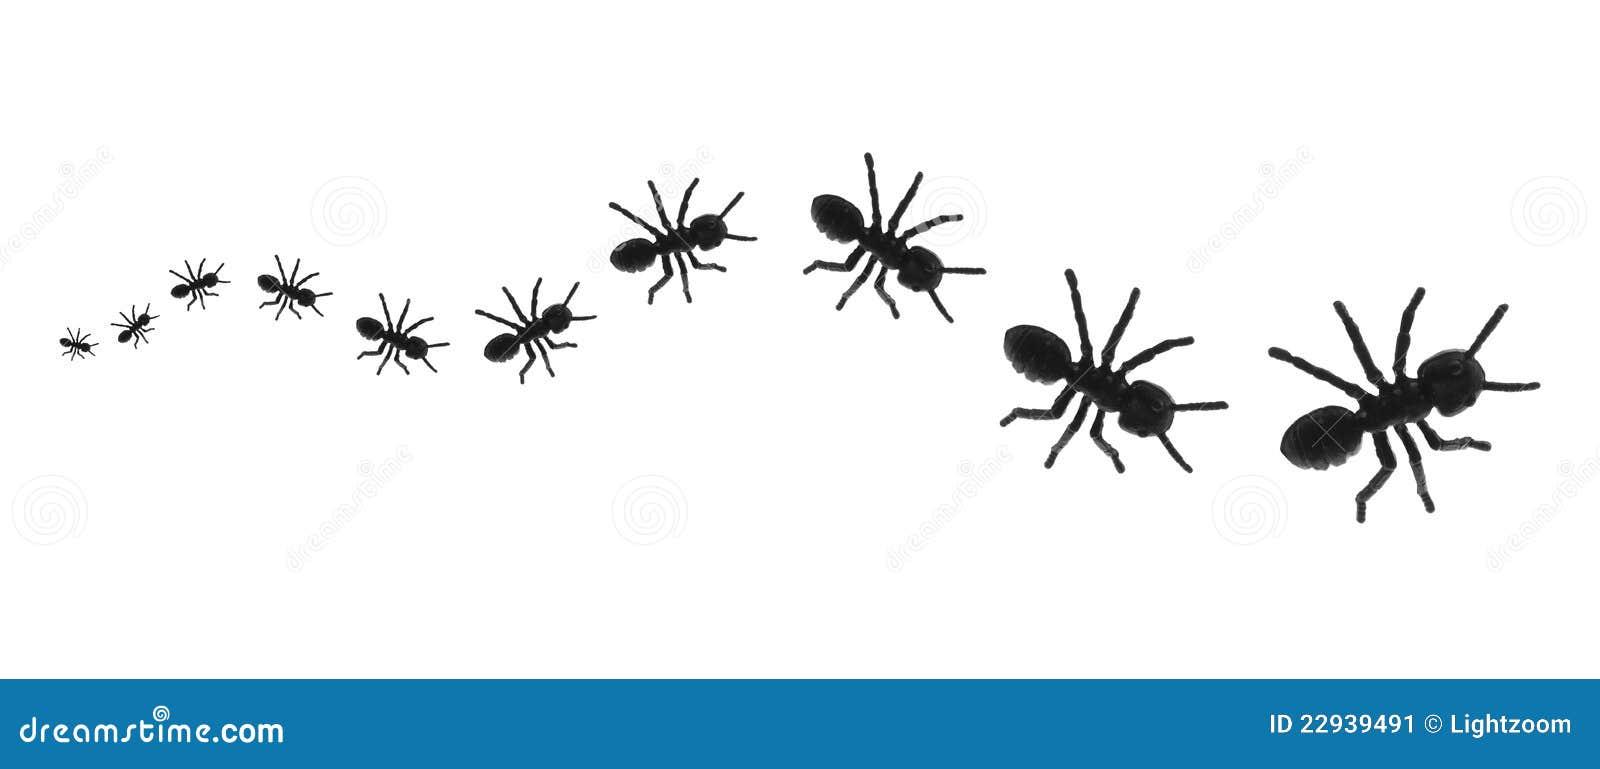 Ants In A Line Clip Art Download standard clip art